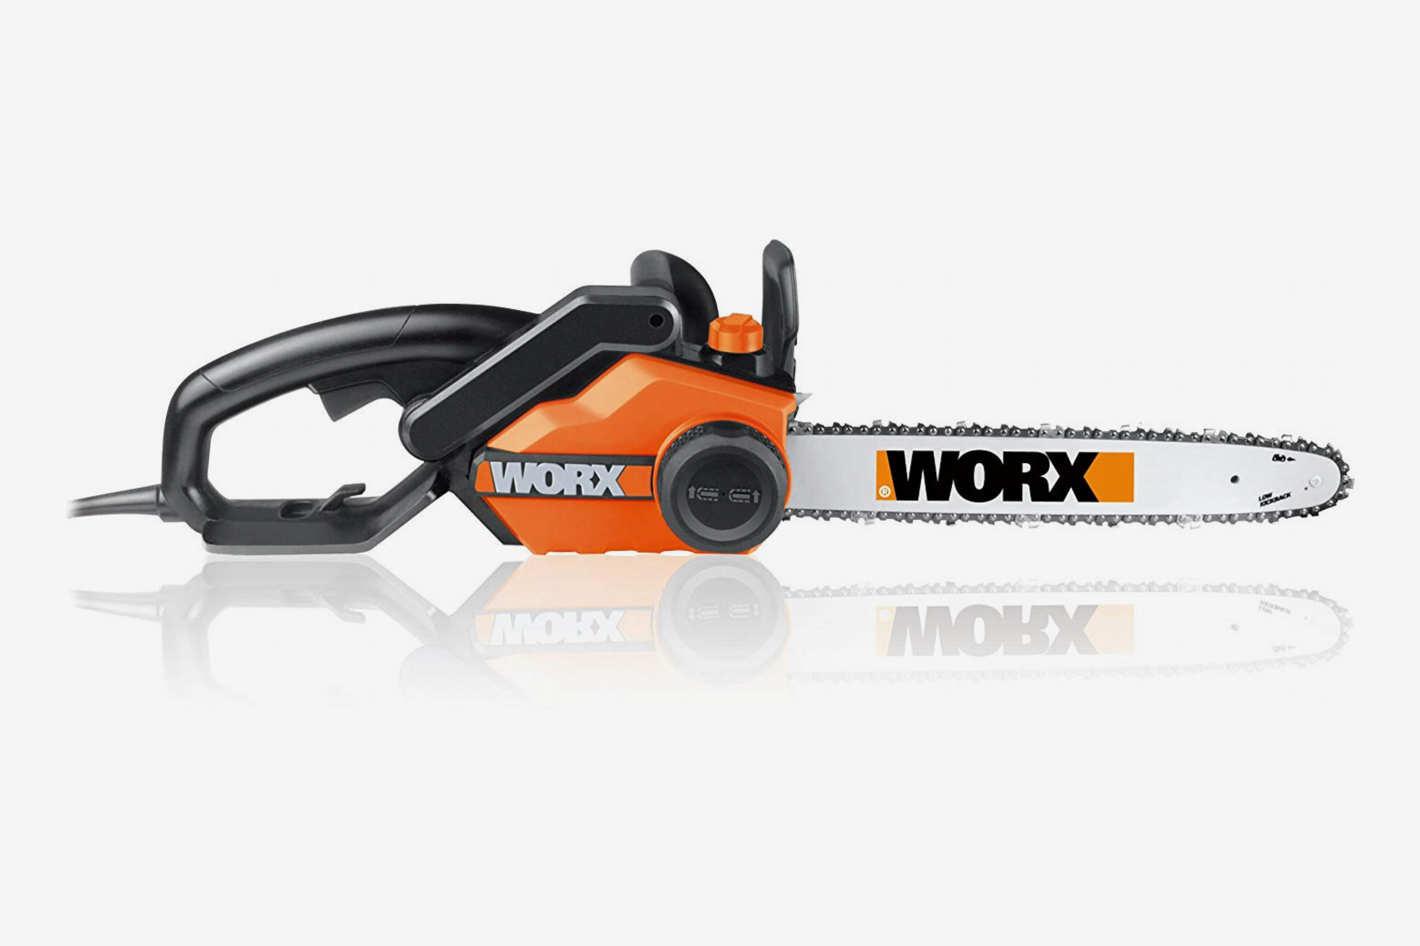 Worx WG304.1 18-Inch 4 15.0 Amp Chainsaw